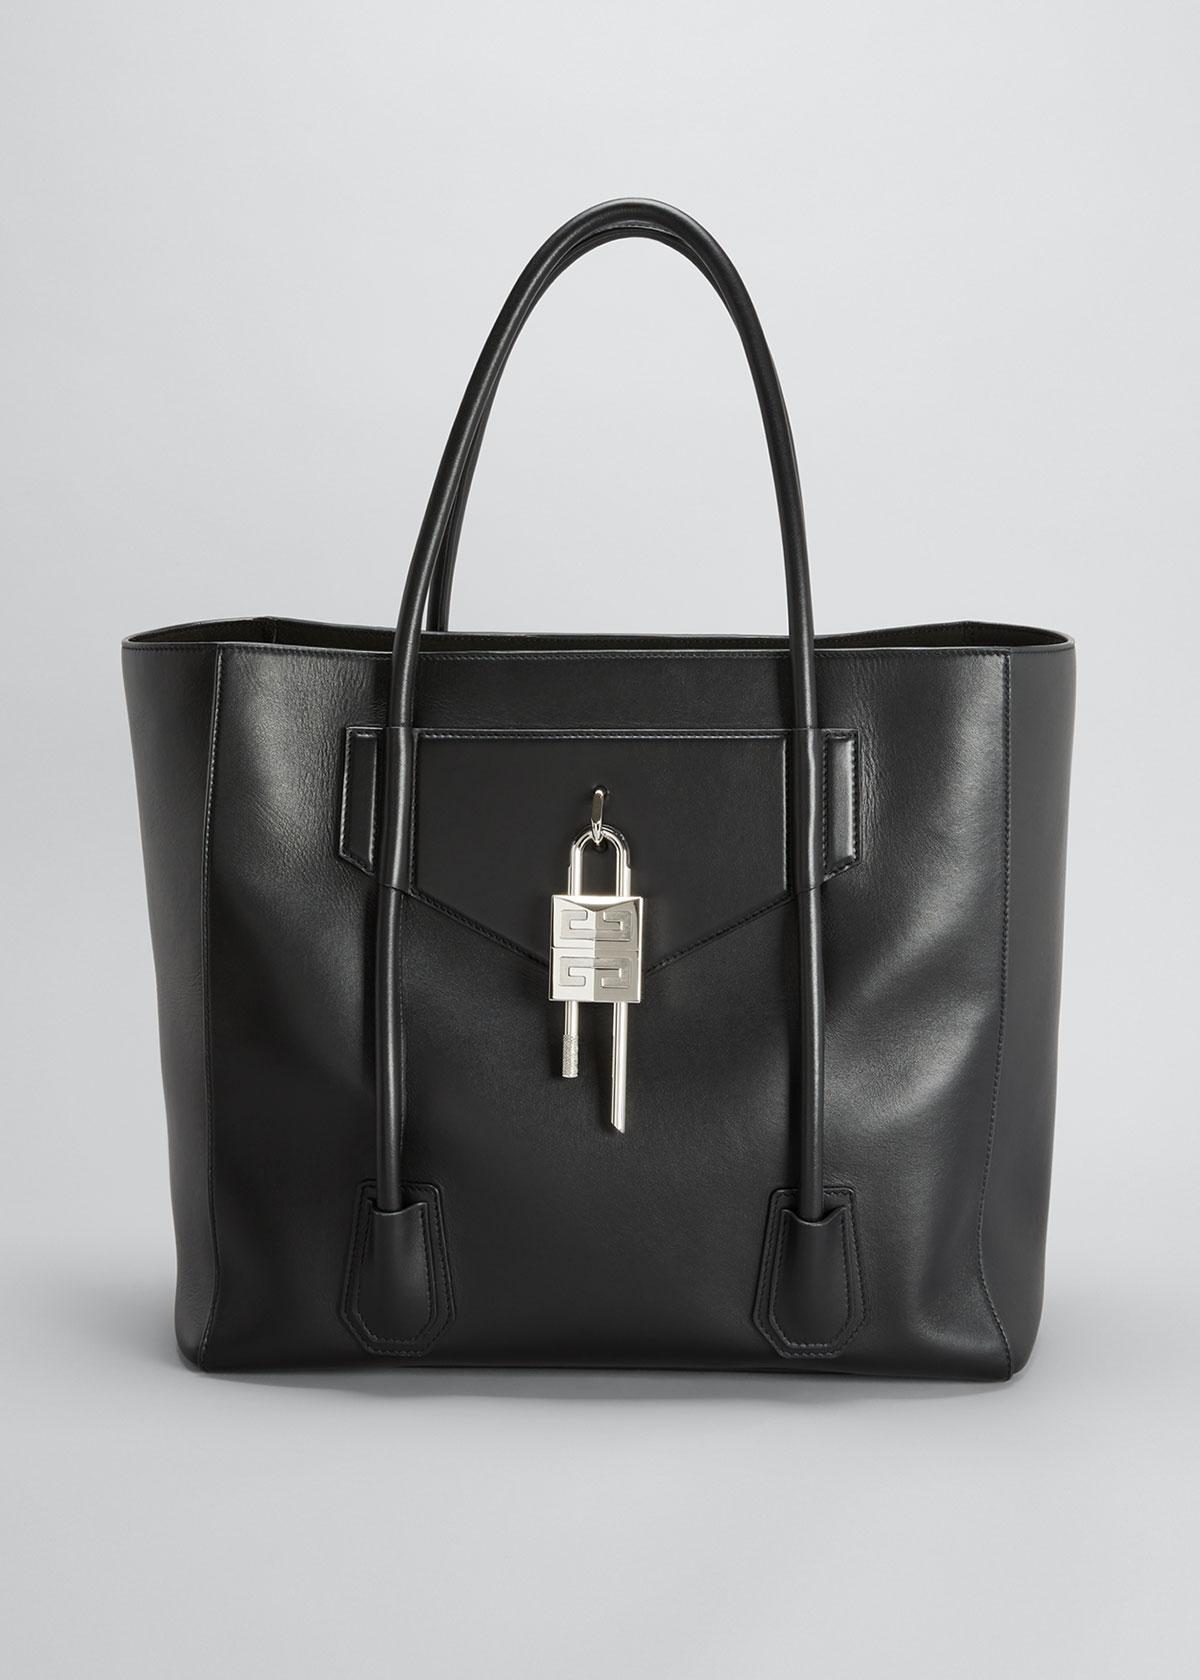 Givenchy Leathers ANTIGONA SOFT TOTE BAG WITH LOCK